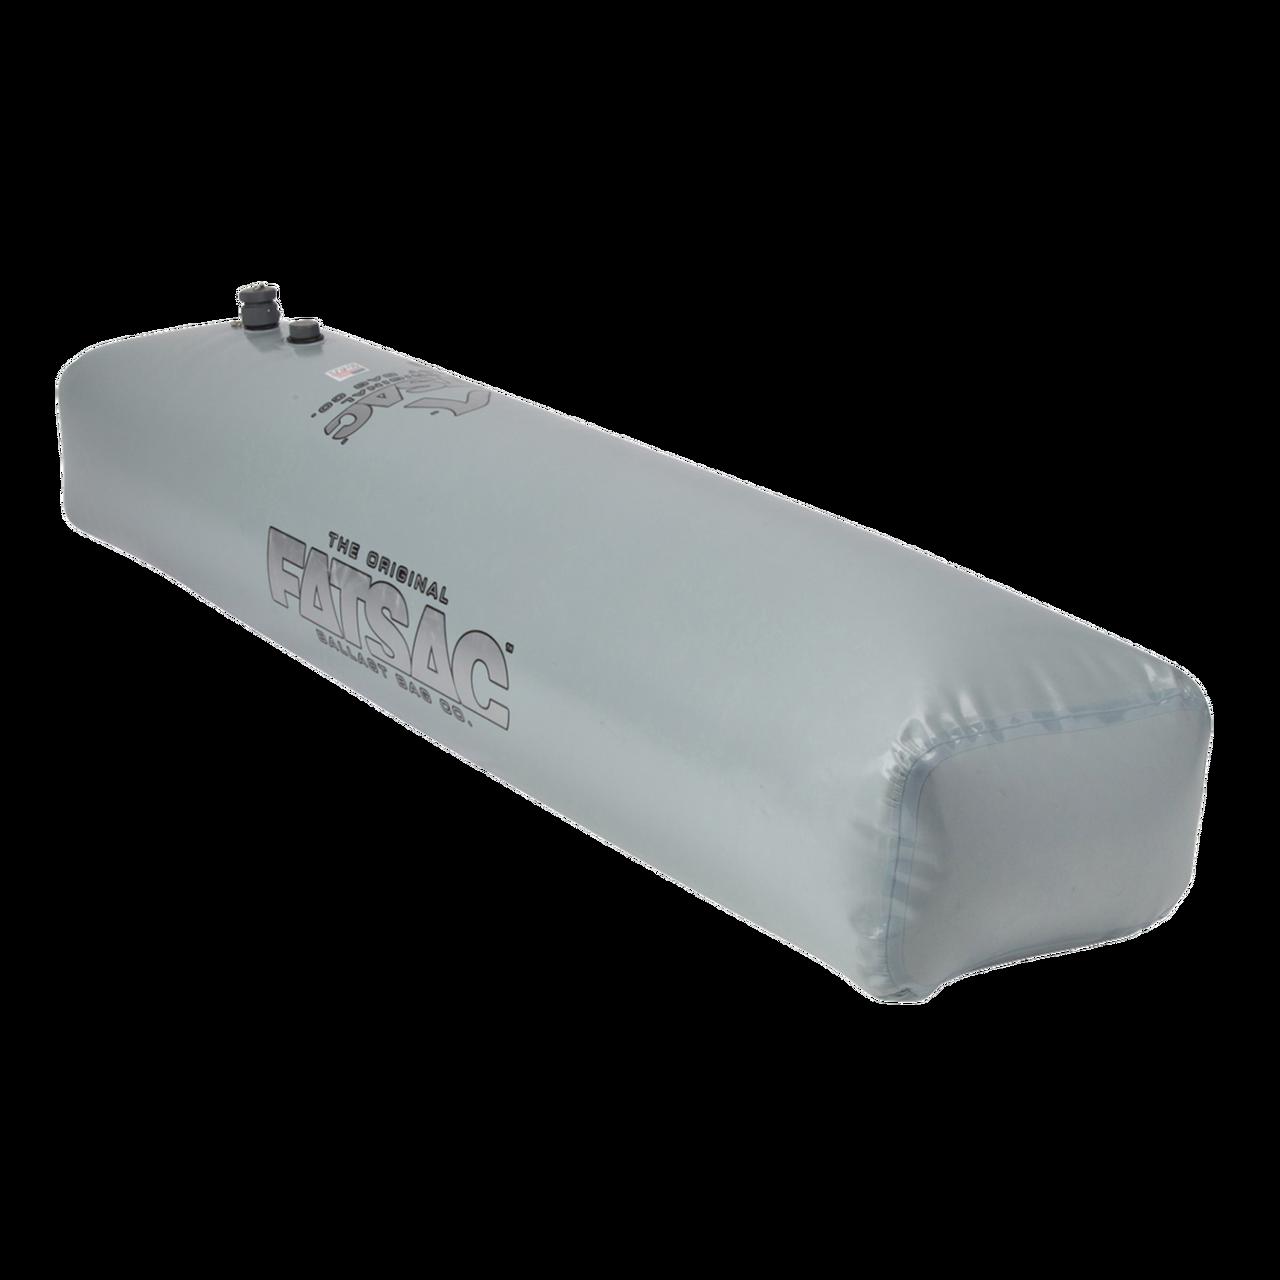 Fat Sac Tube Sac | Ski Locker or Walkway Ballast